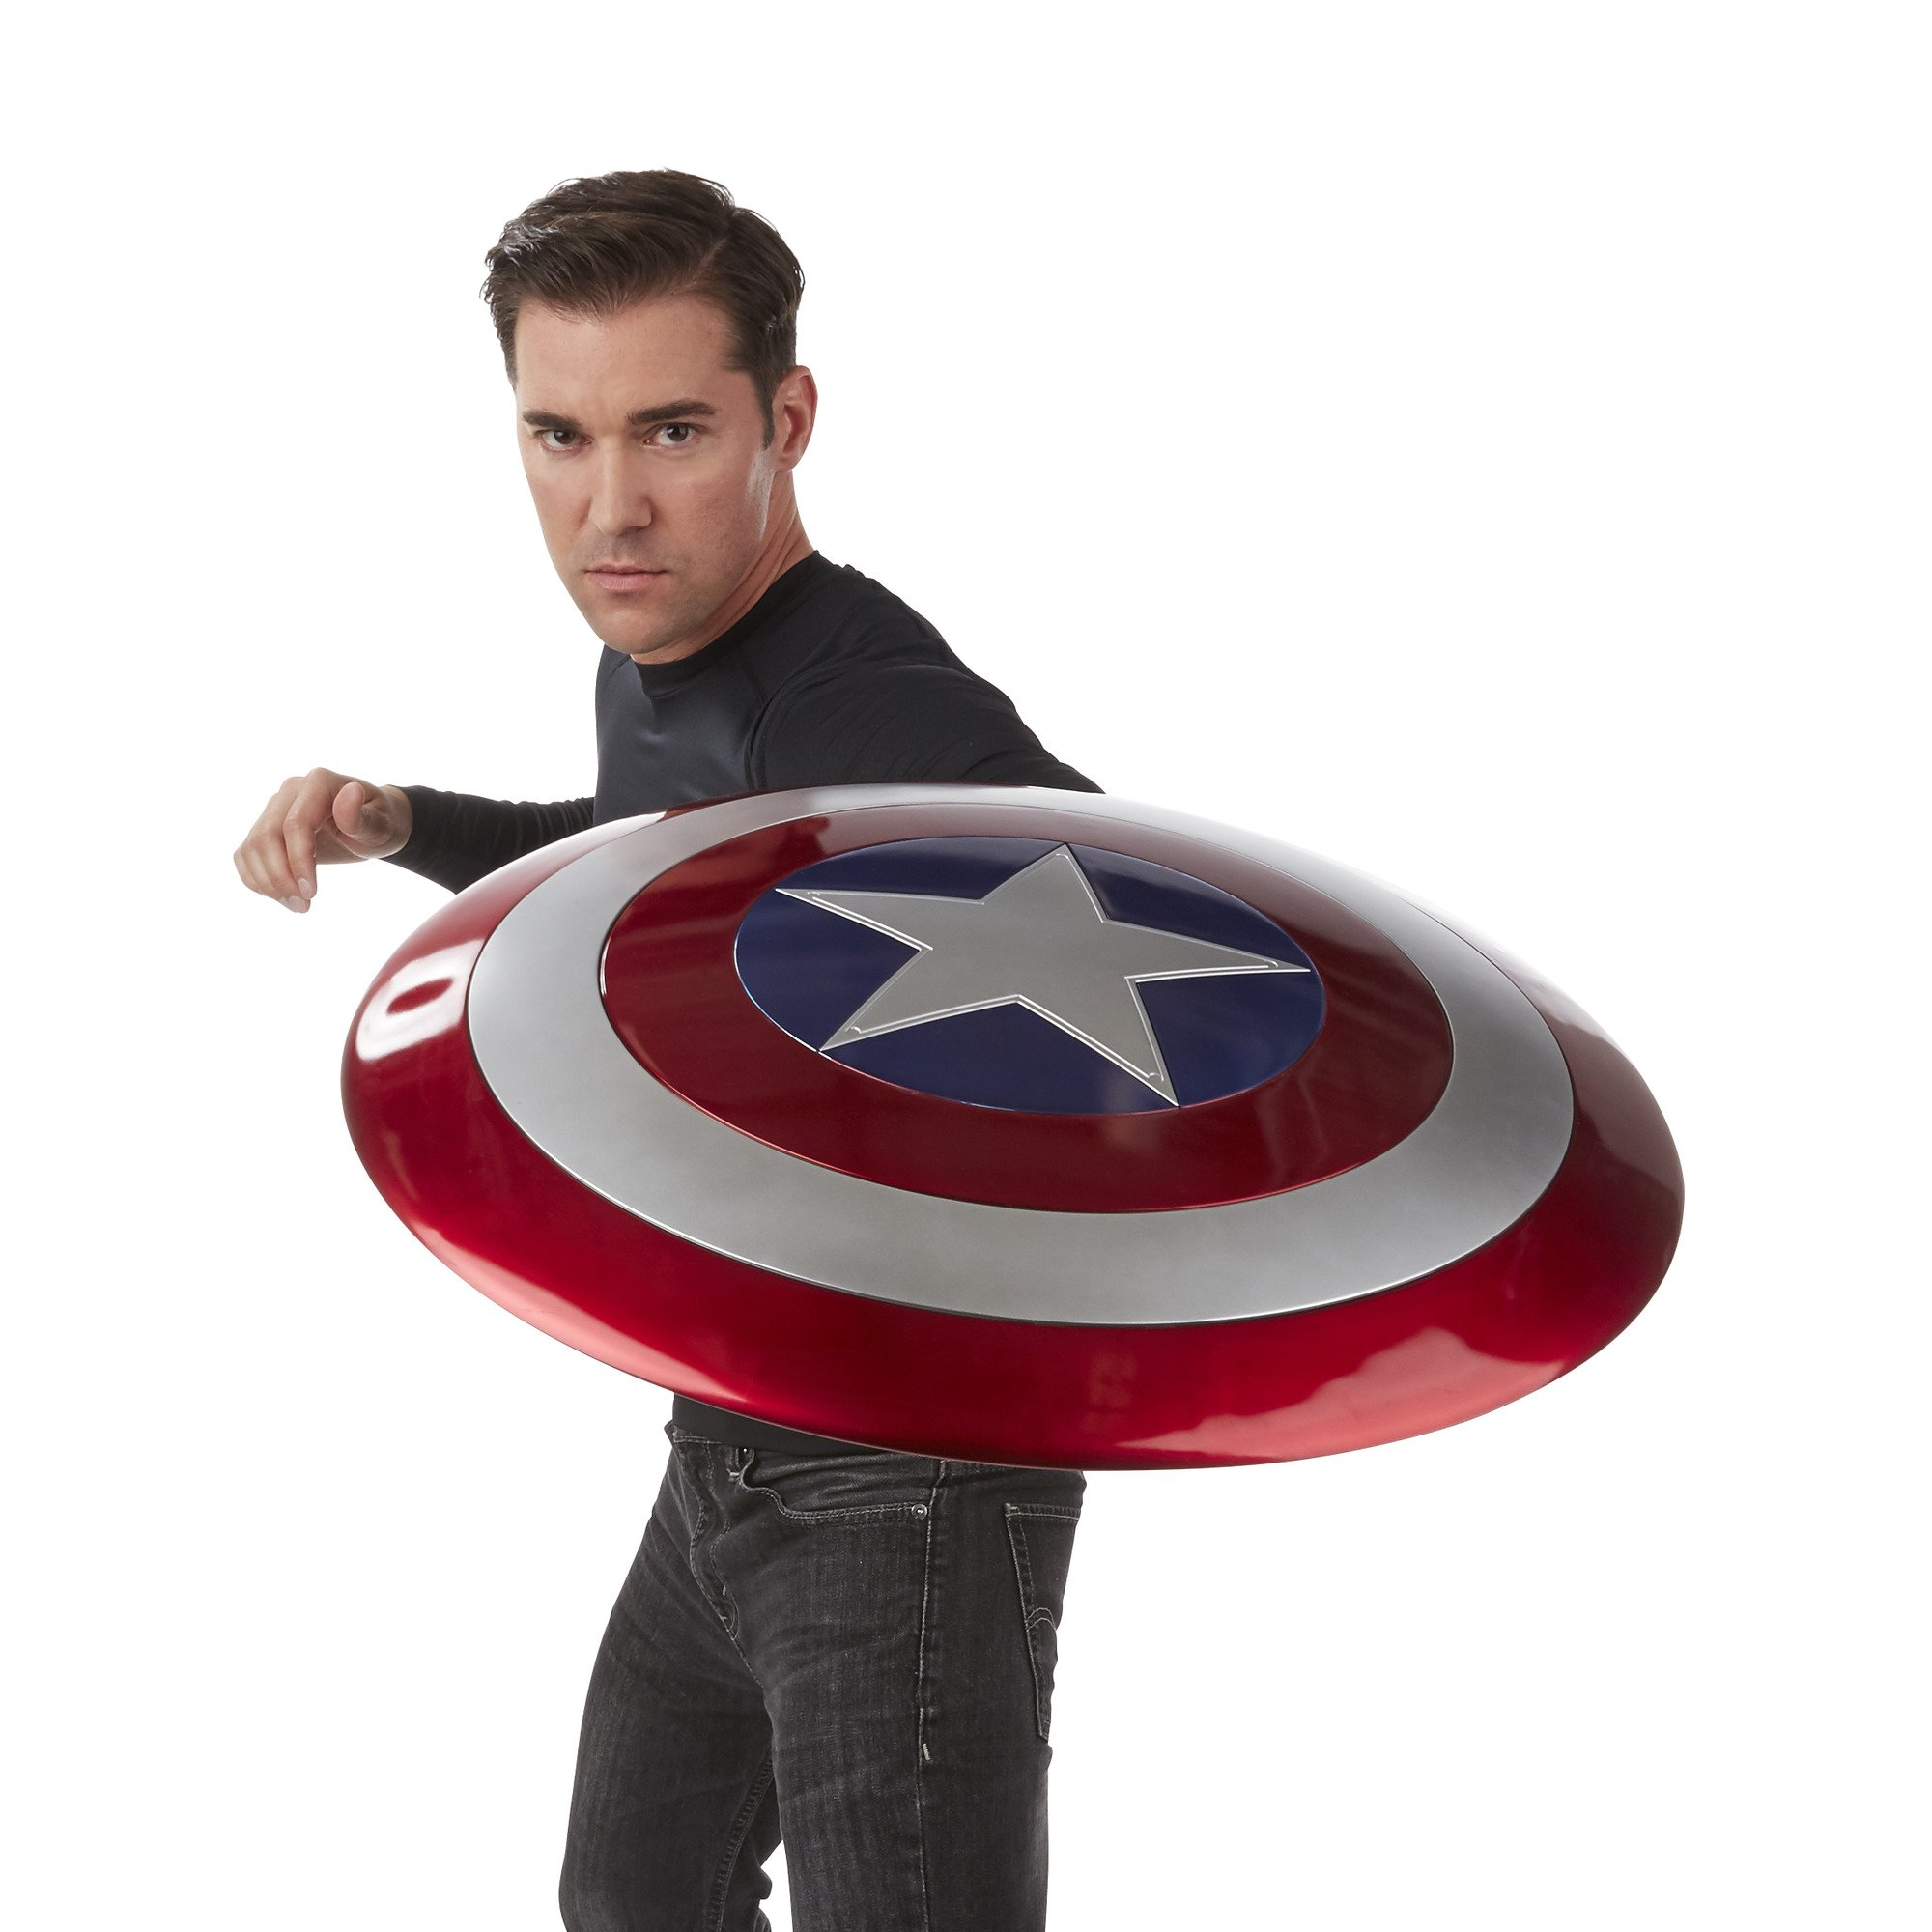 Marvel Legends Captain America Shield by Avengers (Image #9)